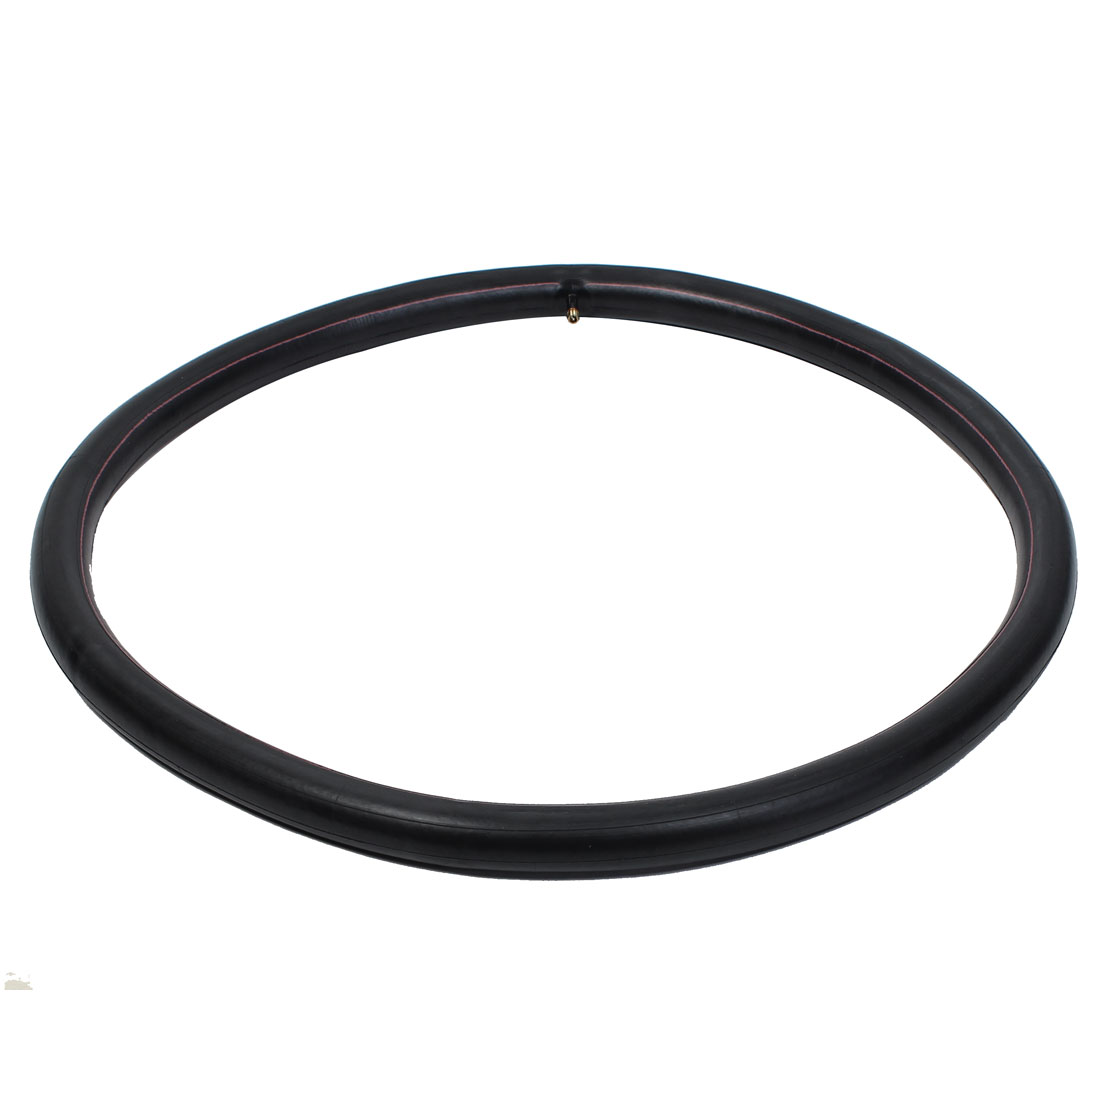 Black Bicycle Bike Cycling Inner Tire Tube 26 x 1.75/1.95/1 3/4